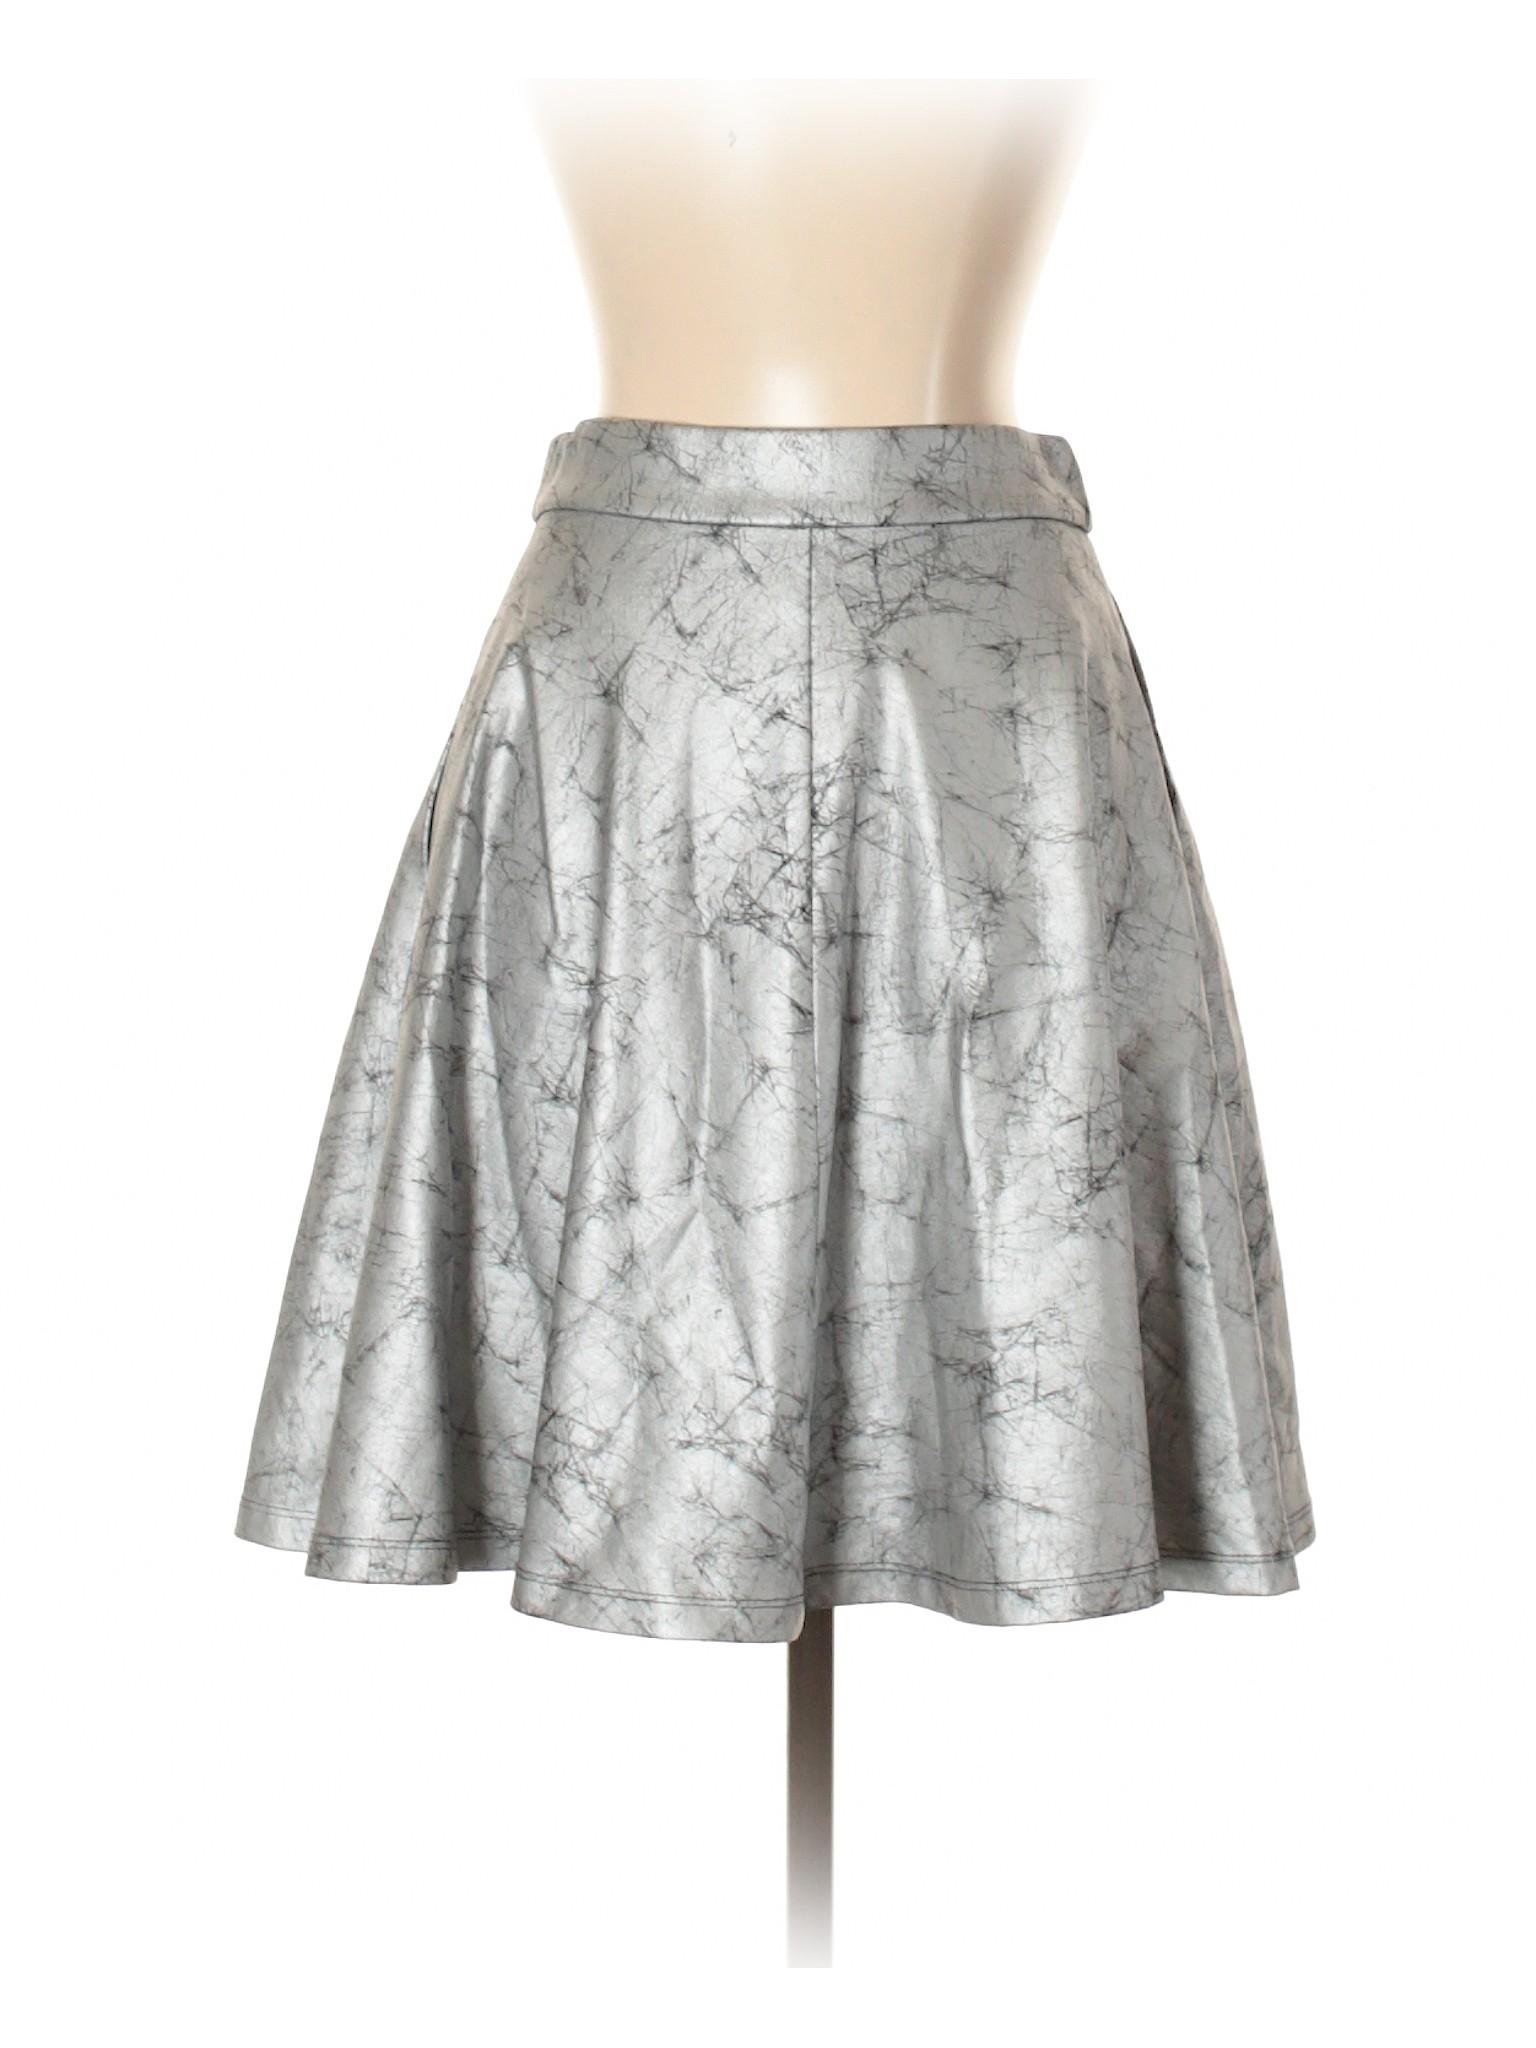 leisure CATHERINE Boutique Skirt Malandrino Catherine Casual dqg8U